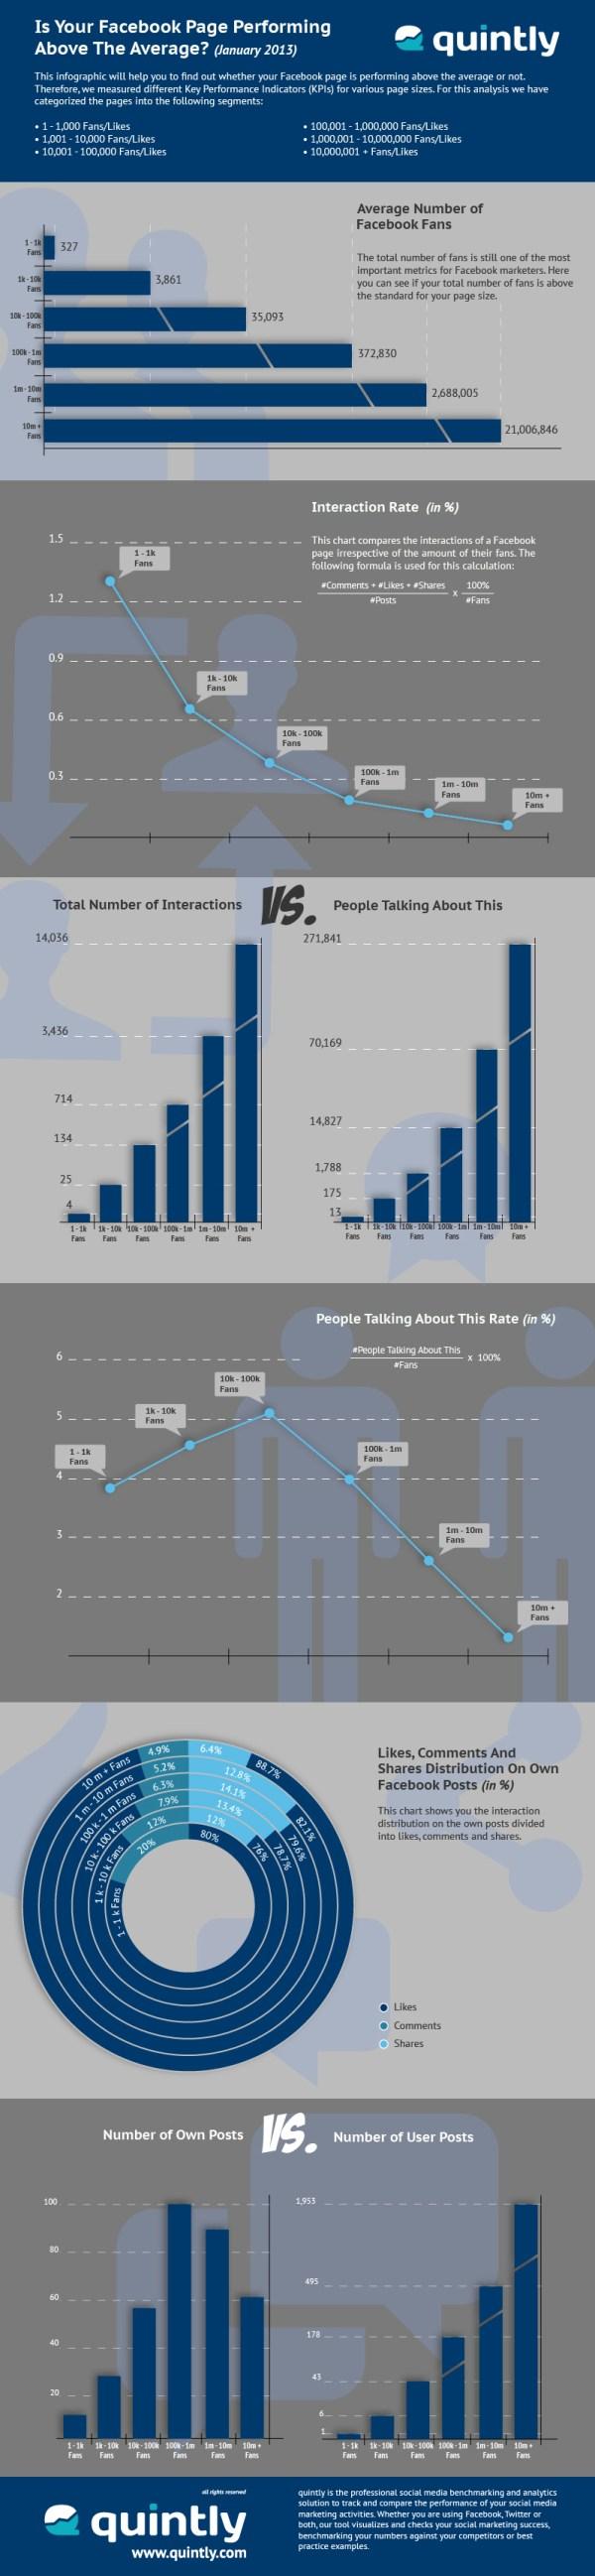 Infografik Facebook Seiten Performance (Quelle: quintly.com)